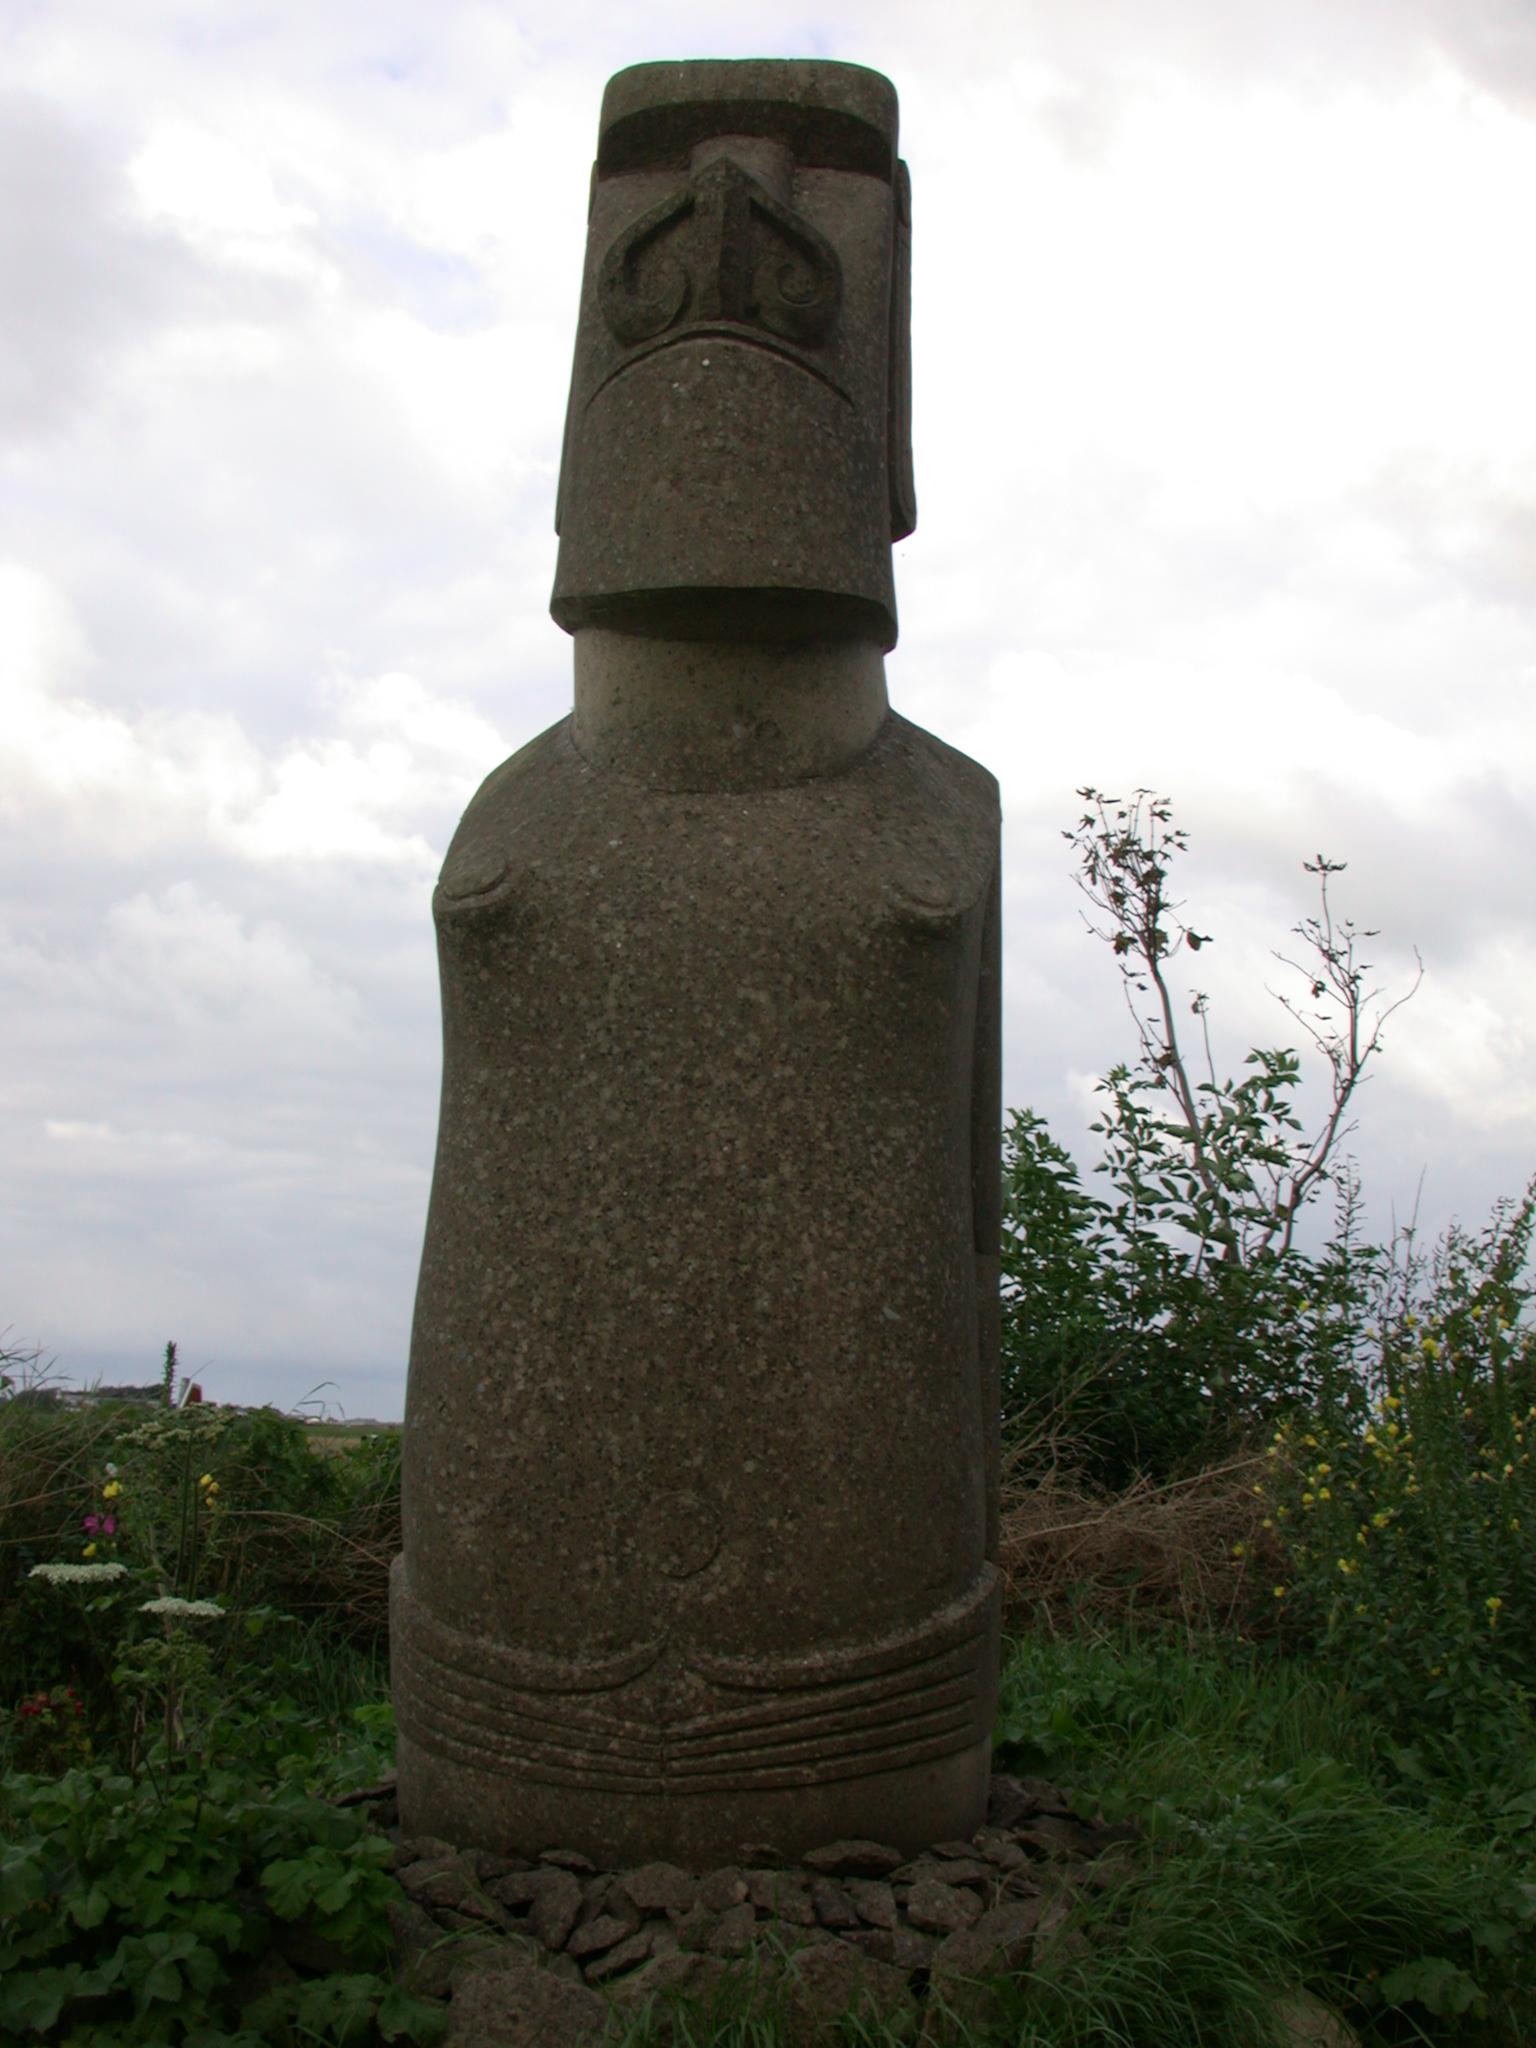 easter island statue green grassstone sculpture